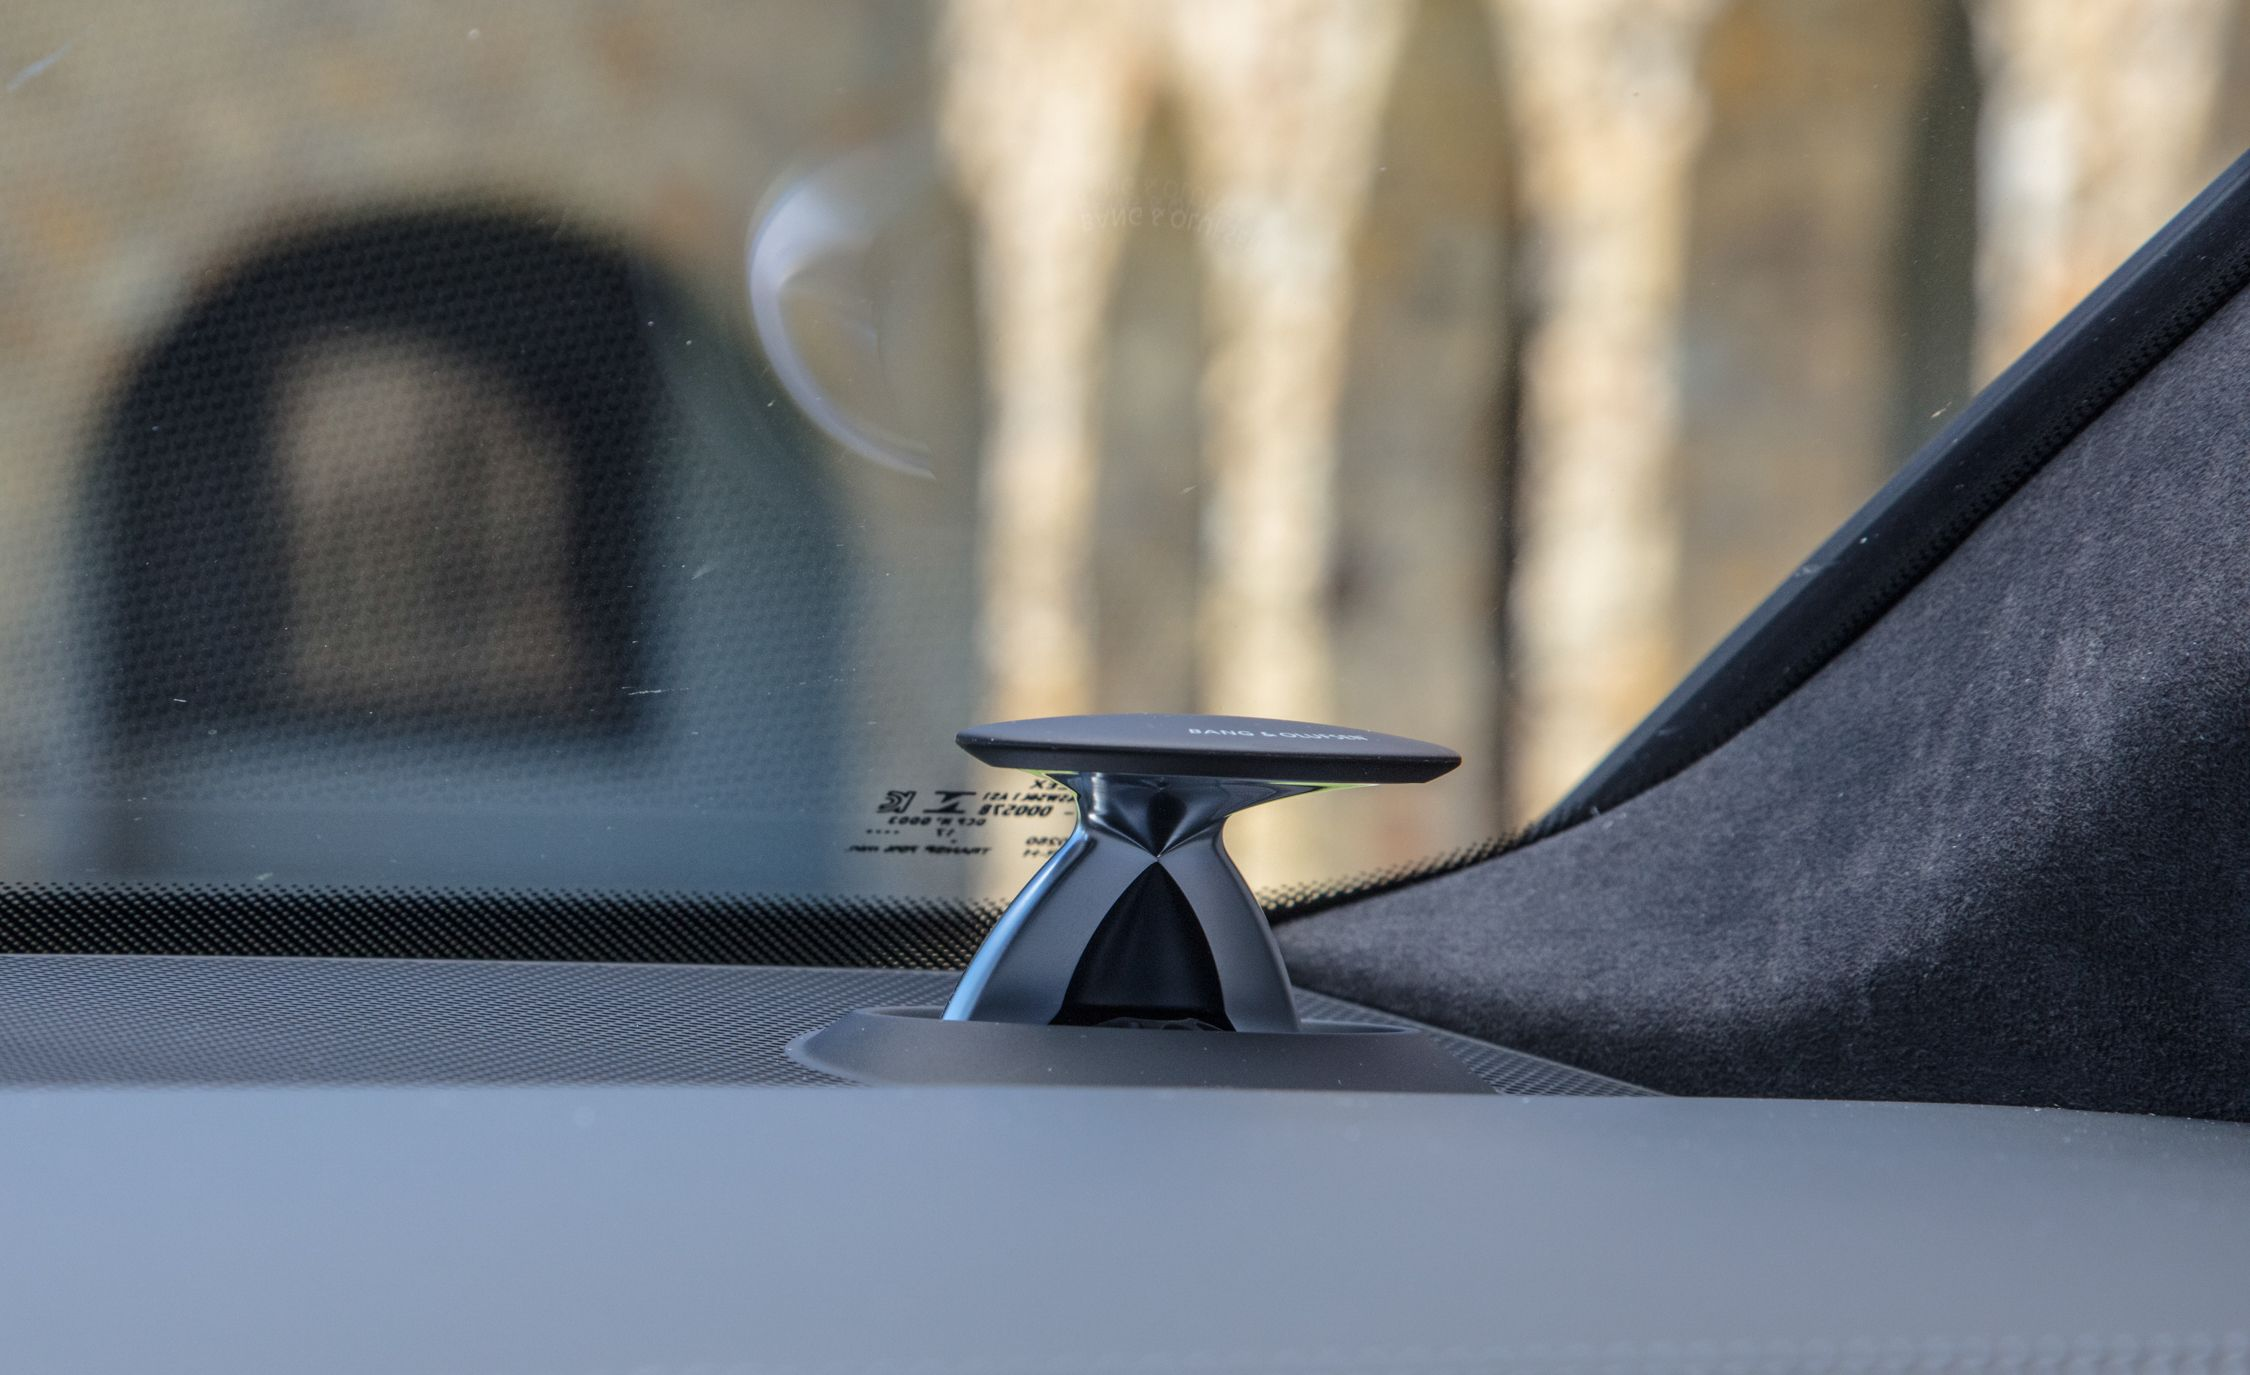 2019-Audi-A7-Sportback-223.jpg